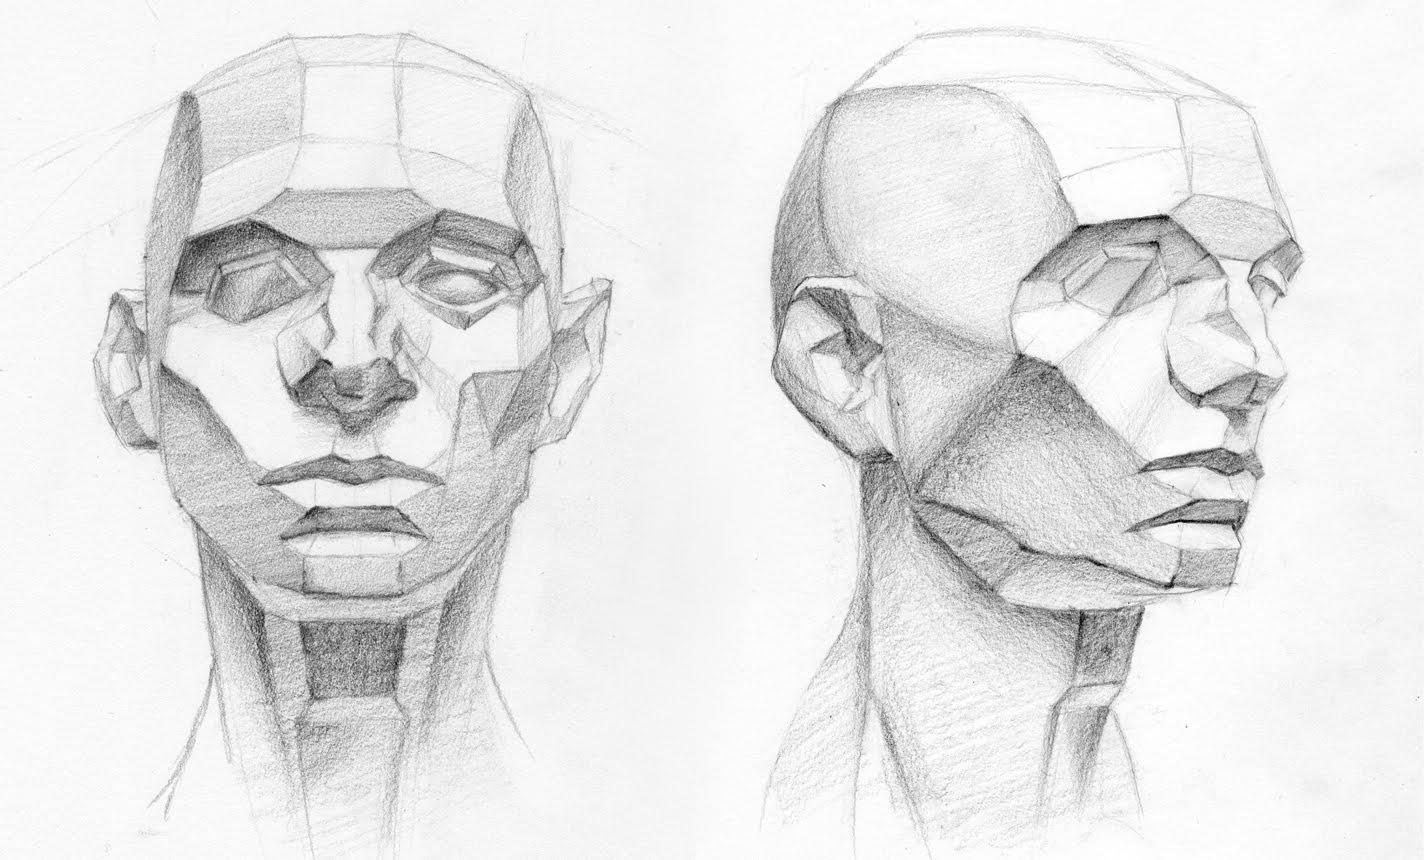 Drawn head anatomical In anatomy critiques  anatomy